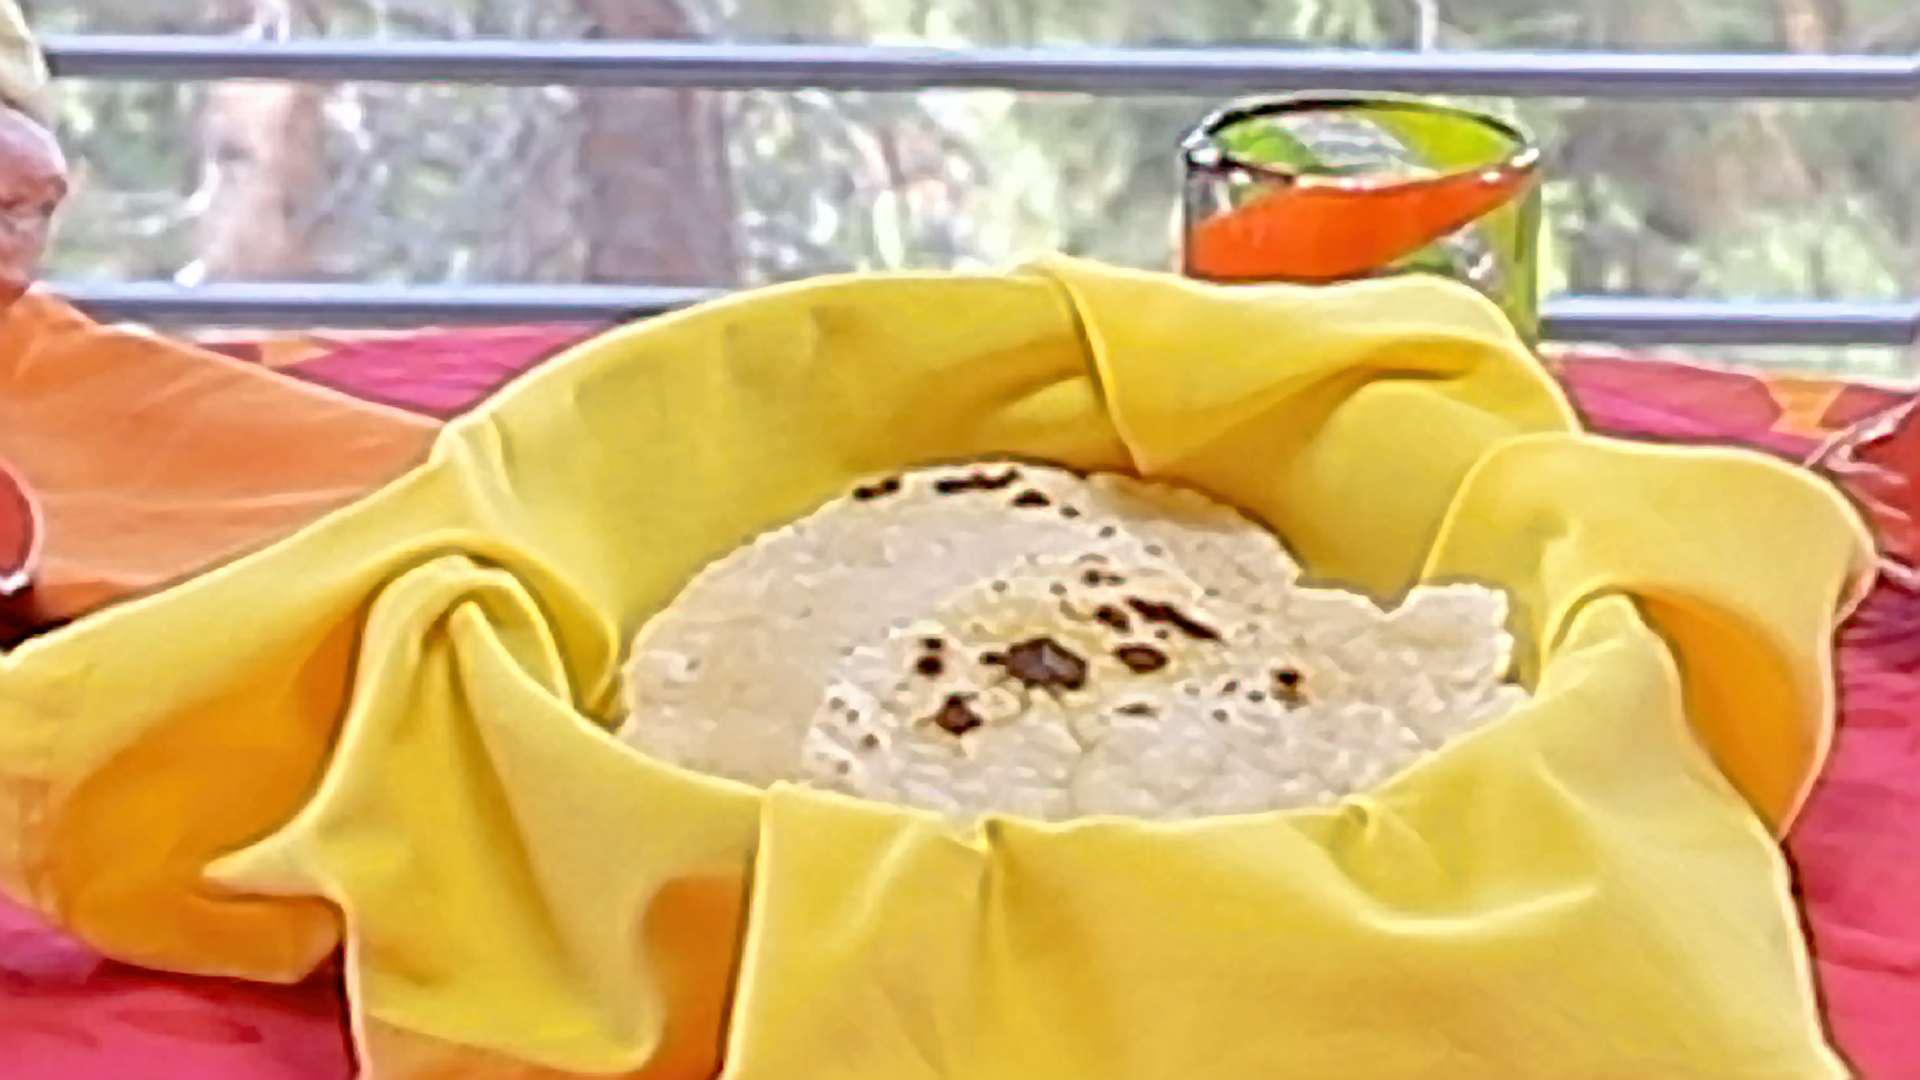 Plate of gluten-free tortillas